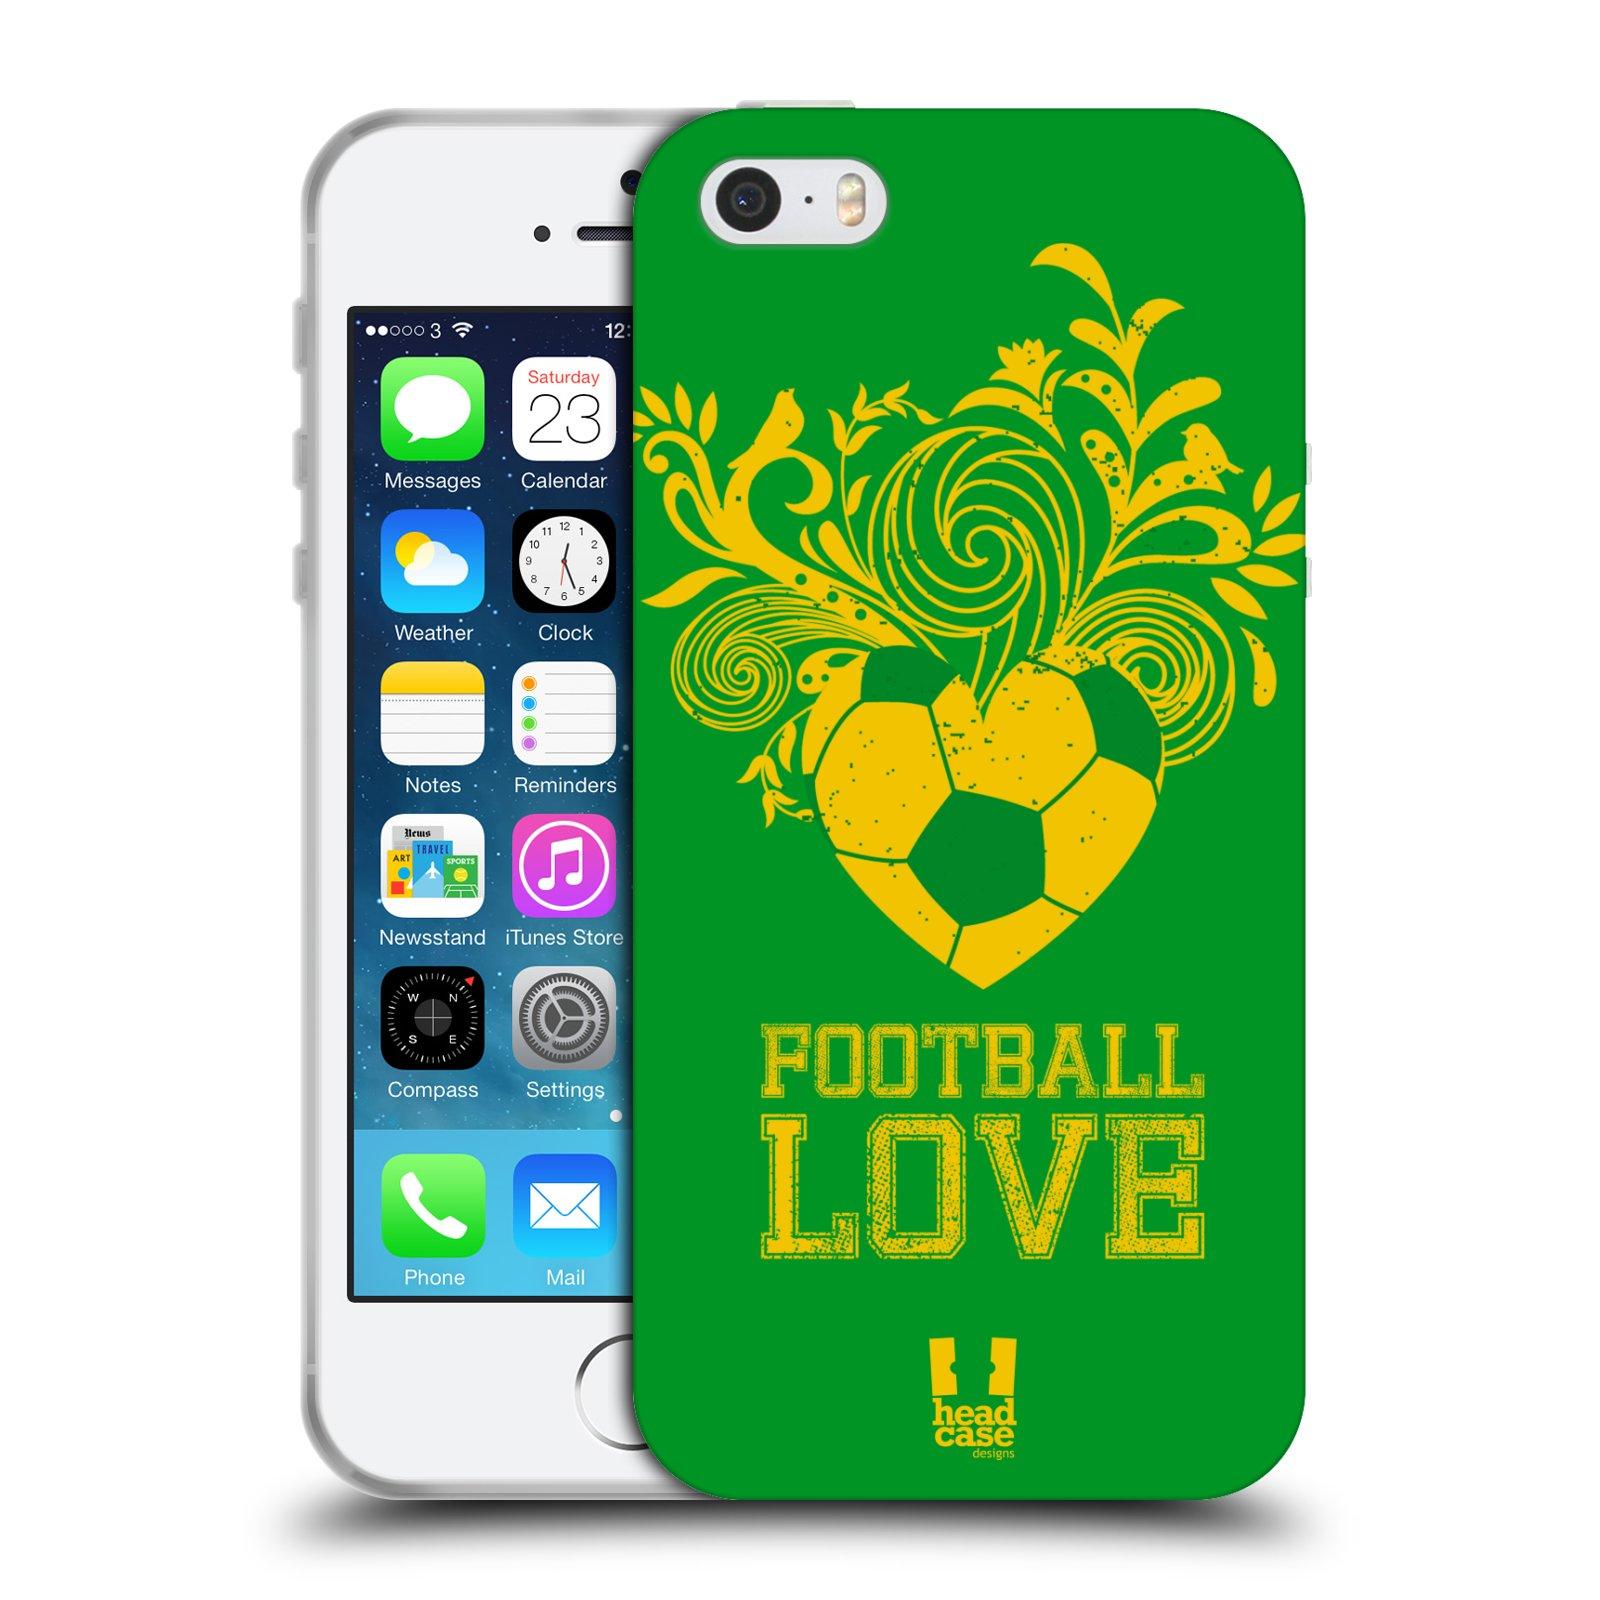 HEAD CASE silikonový obal na mobil Apple Iphone 5 5S Sport fotbalová láska  zelená barva 62b6665f010